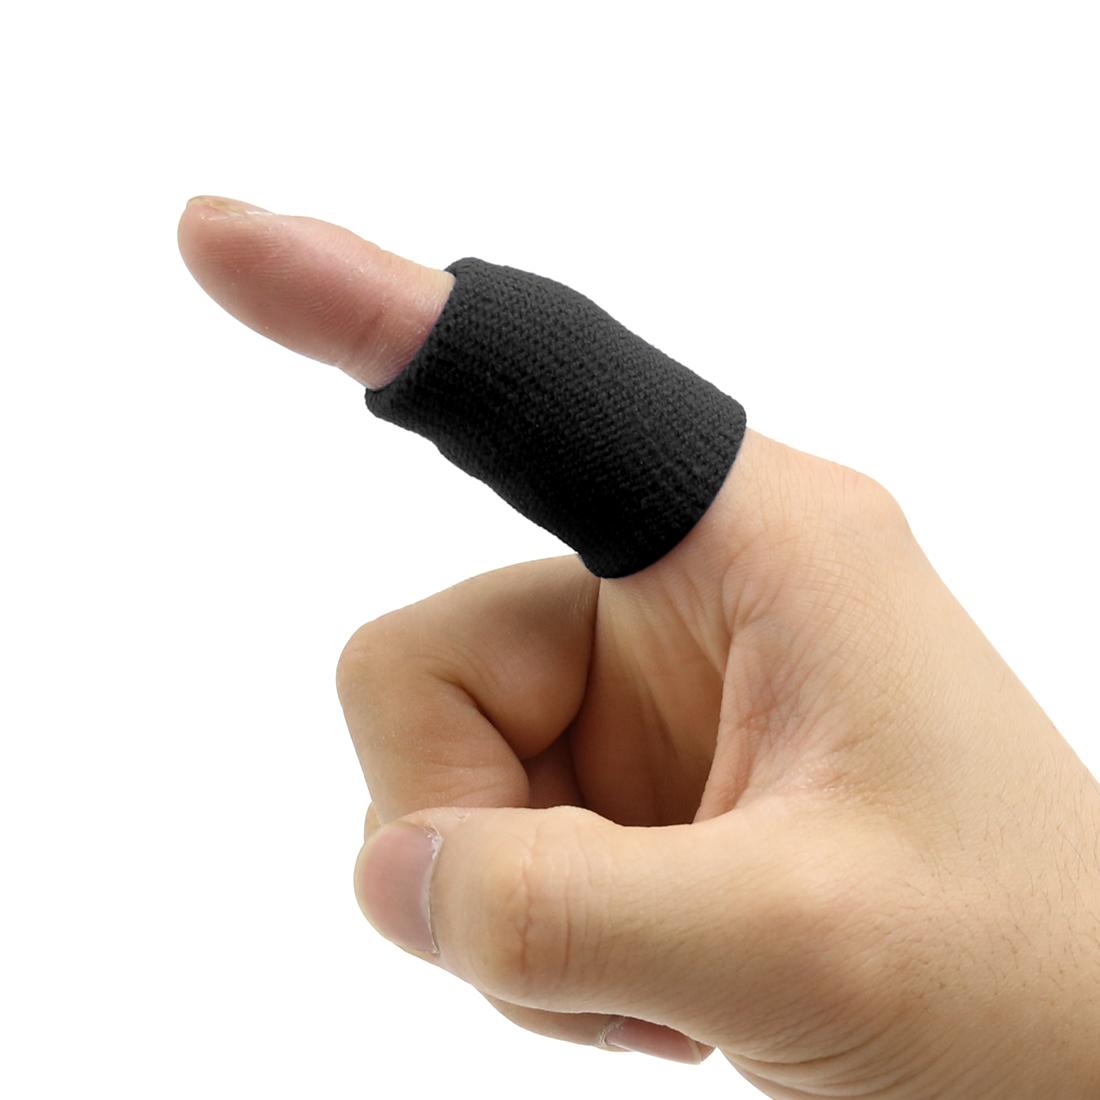 10 pcs Elastic Sport Protector Finger Sleeve Support Thumb Splint Brace